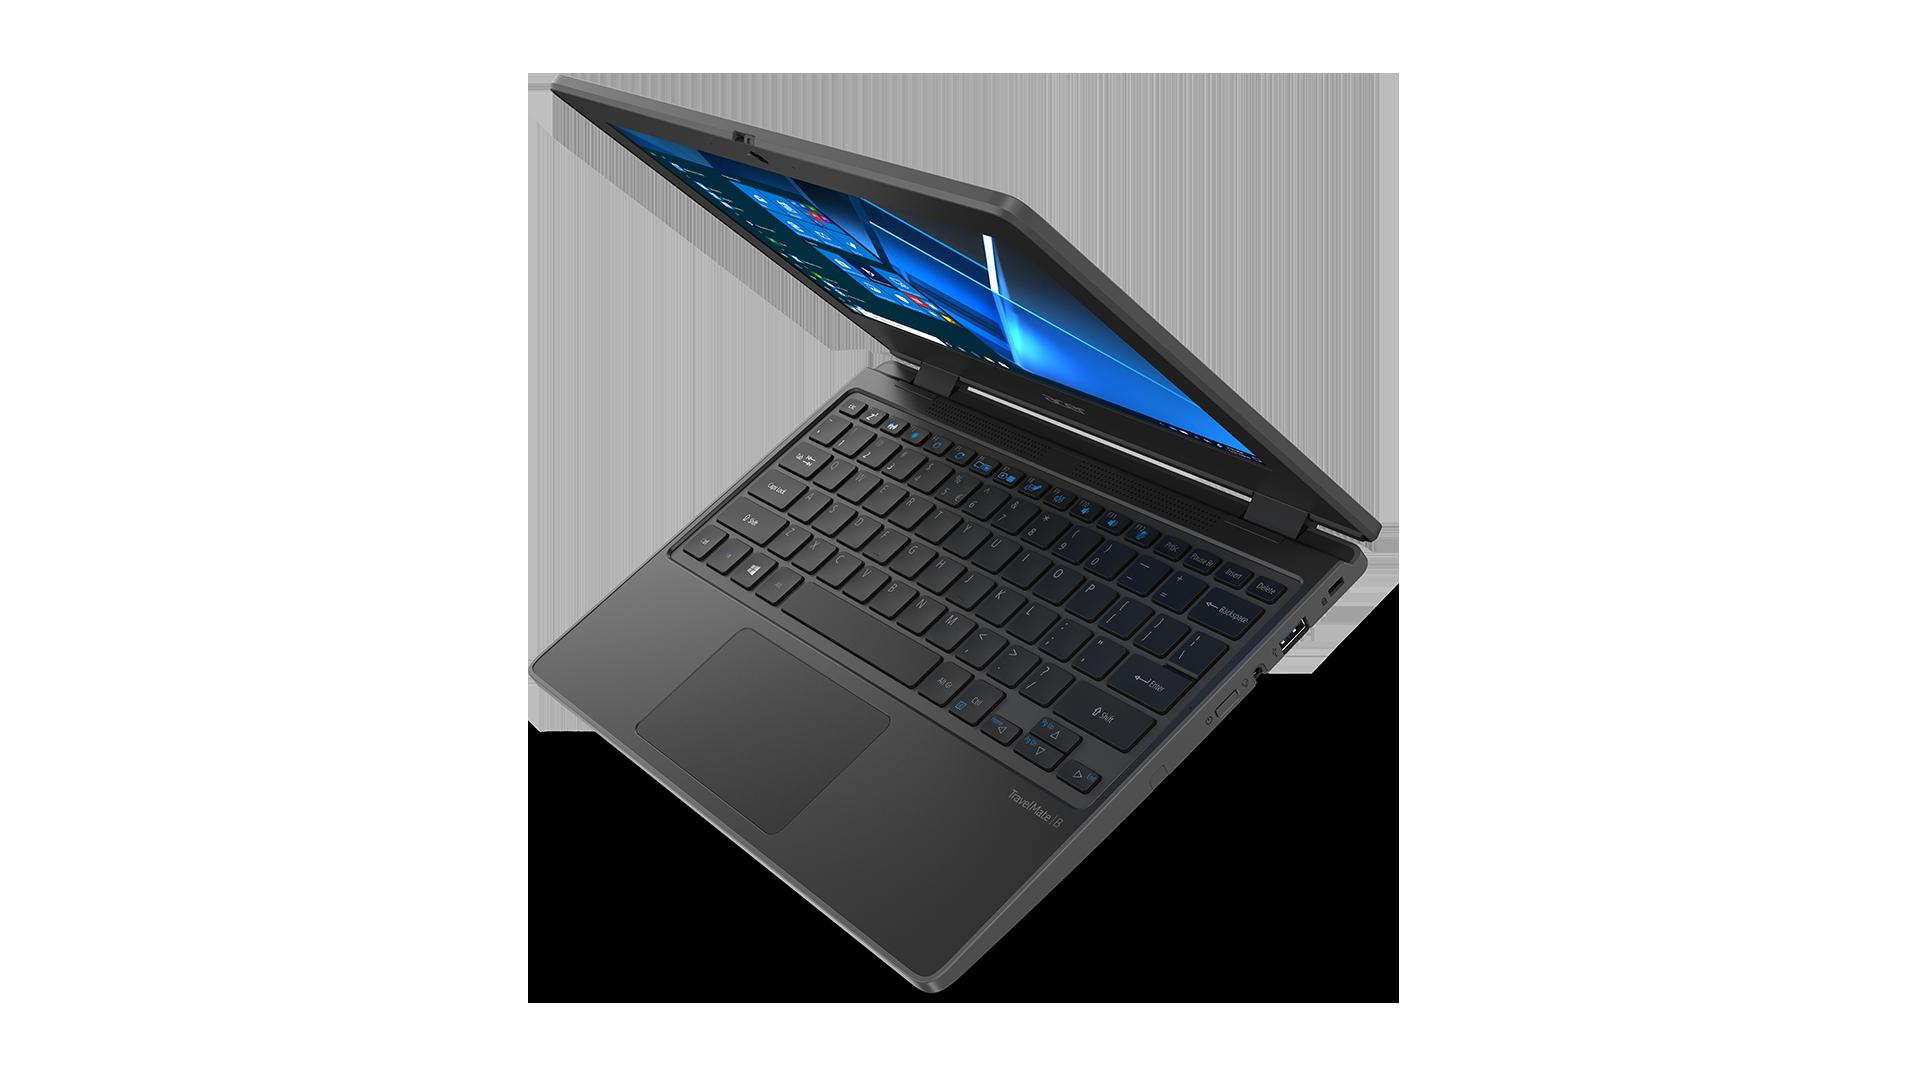 Acer annuncia i notebook convertibili TravelMate B3 e Spin B3 3